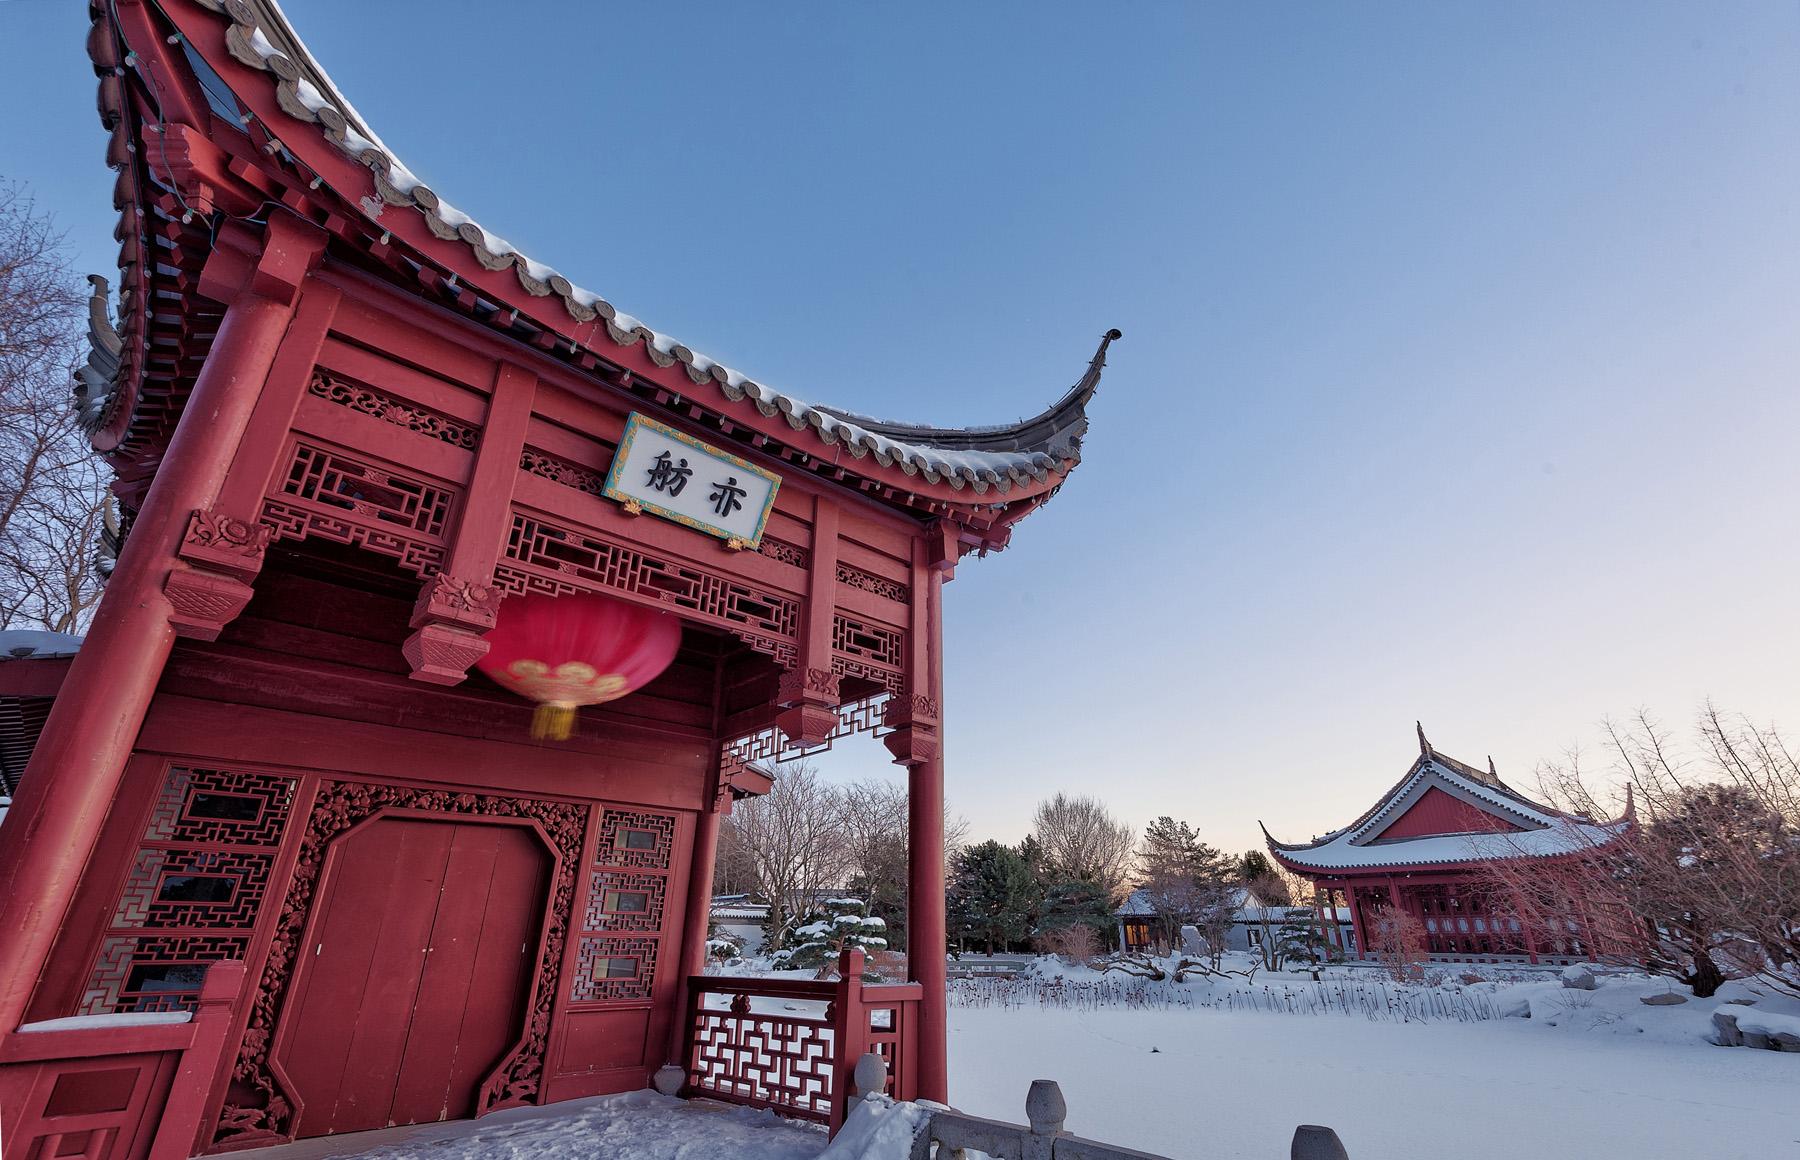 editorial-travel-montreal-botanical-garden-snow-winter-dusk-003